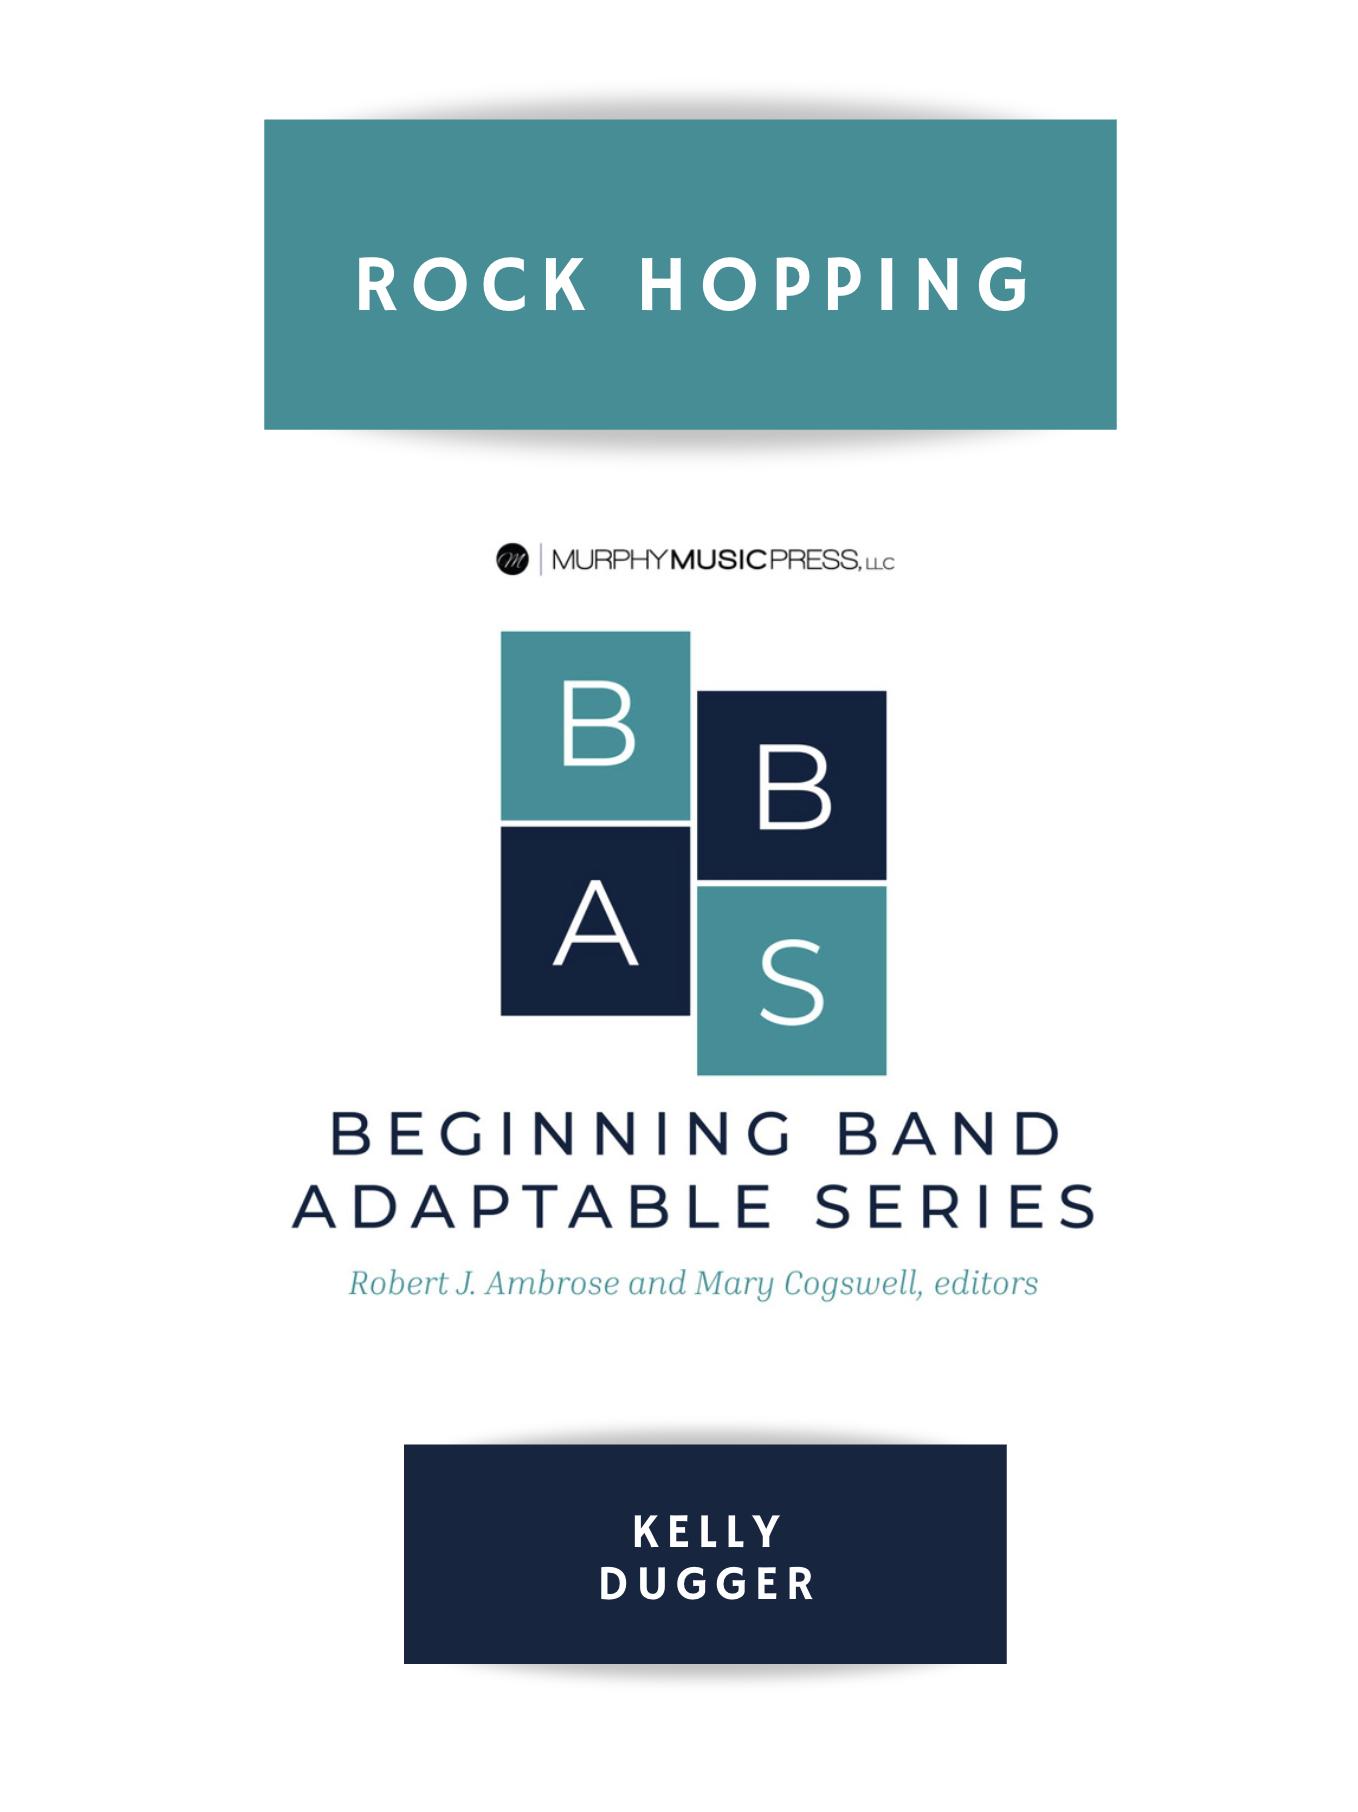 Rock Hopping by Kelly Dugger